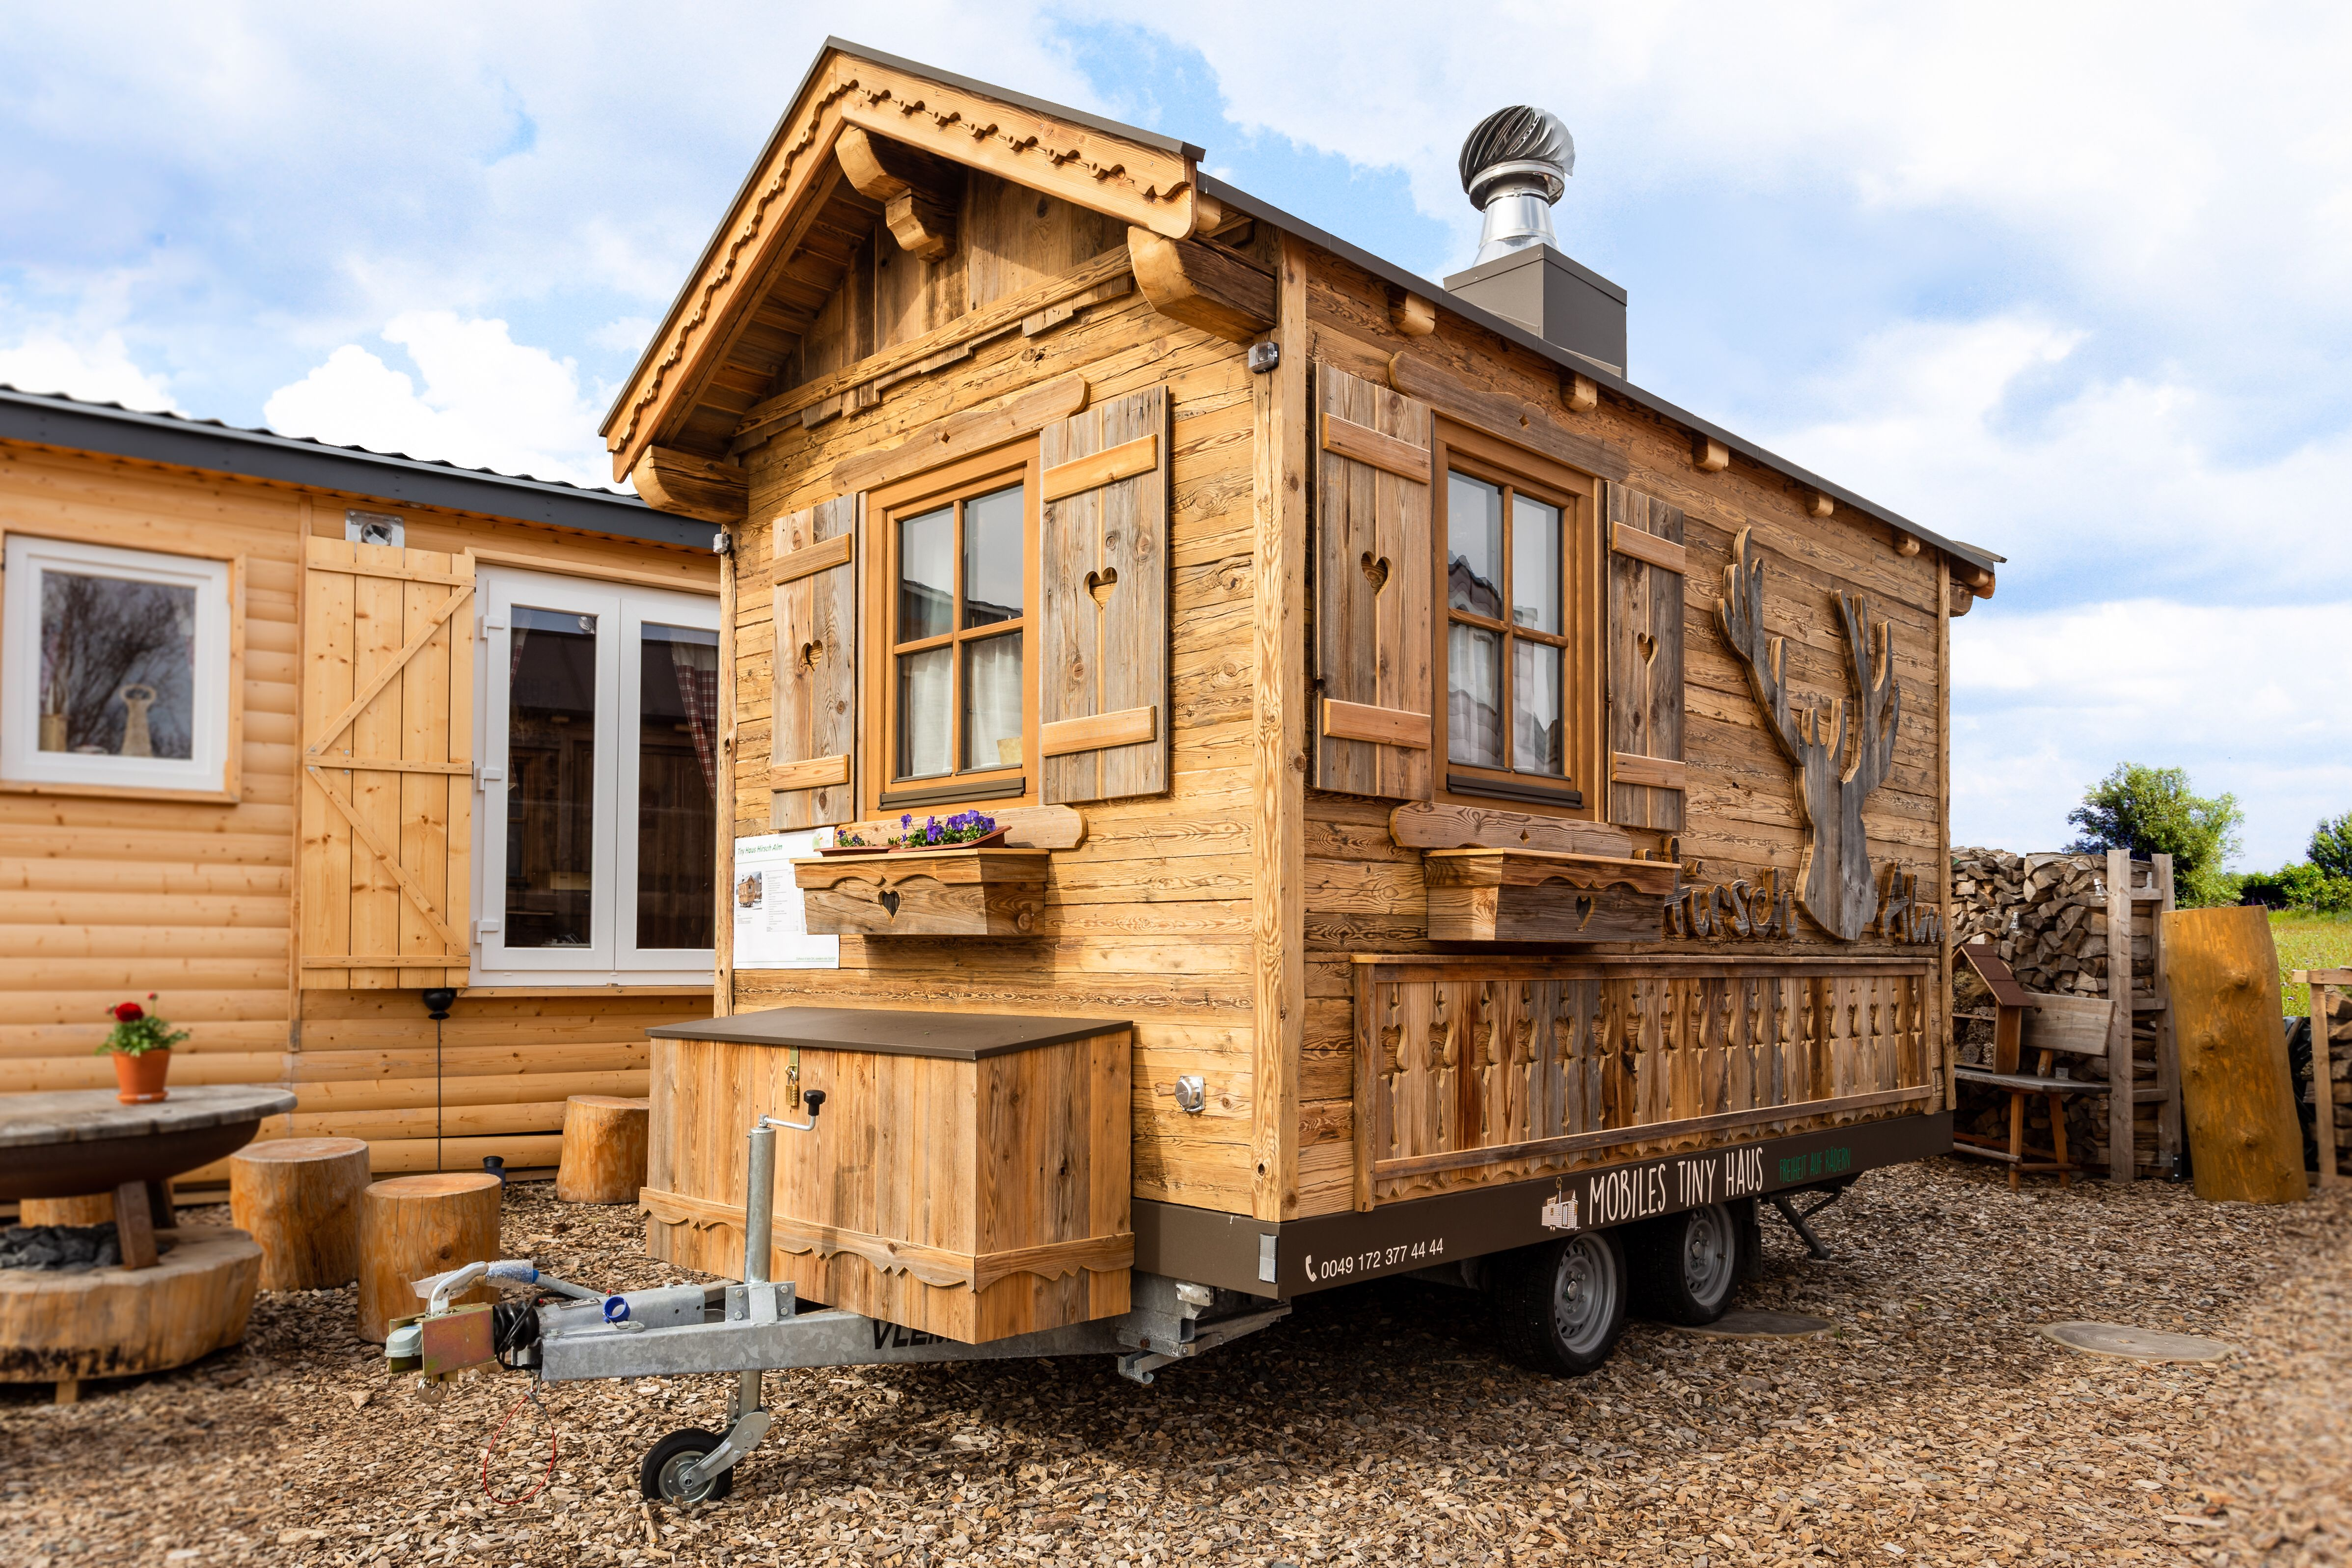 Tiny Haus Auf Rädern